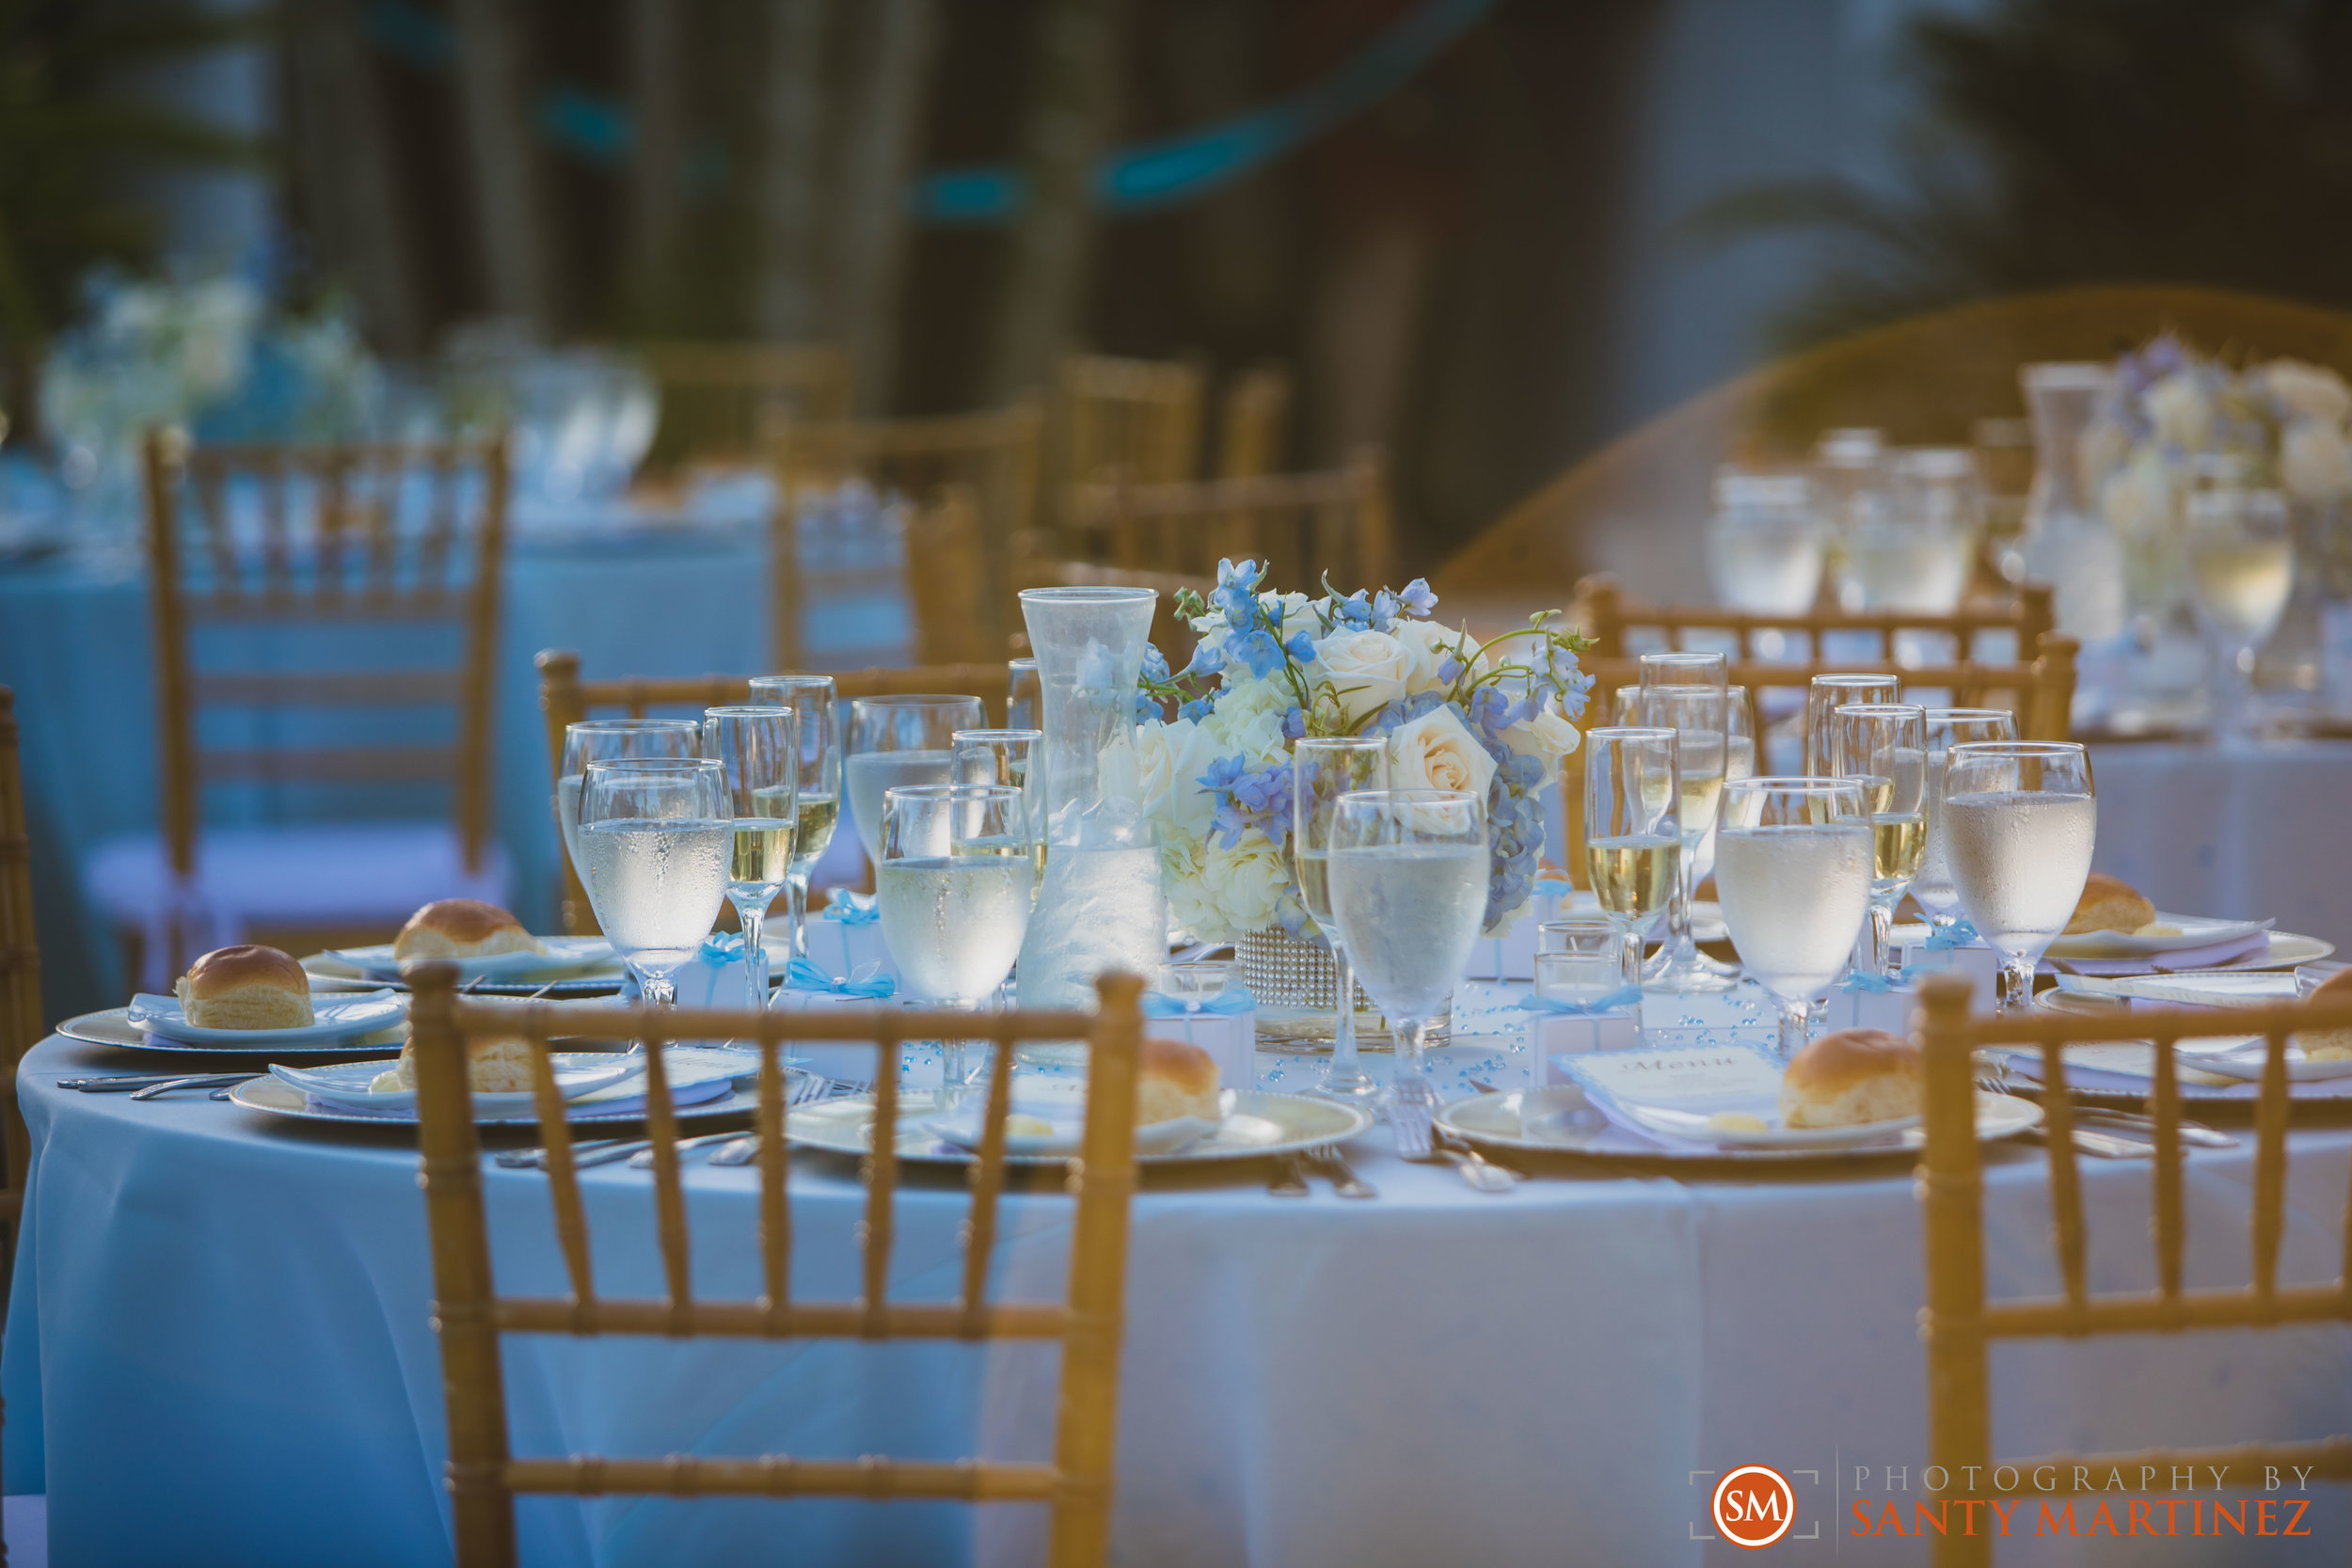 Wedding - Whimsical key West House - Photography by Santy Martinez-32.jpg